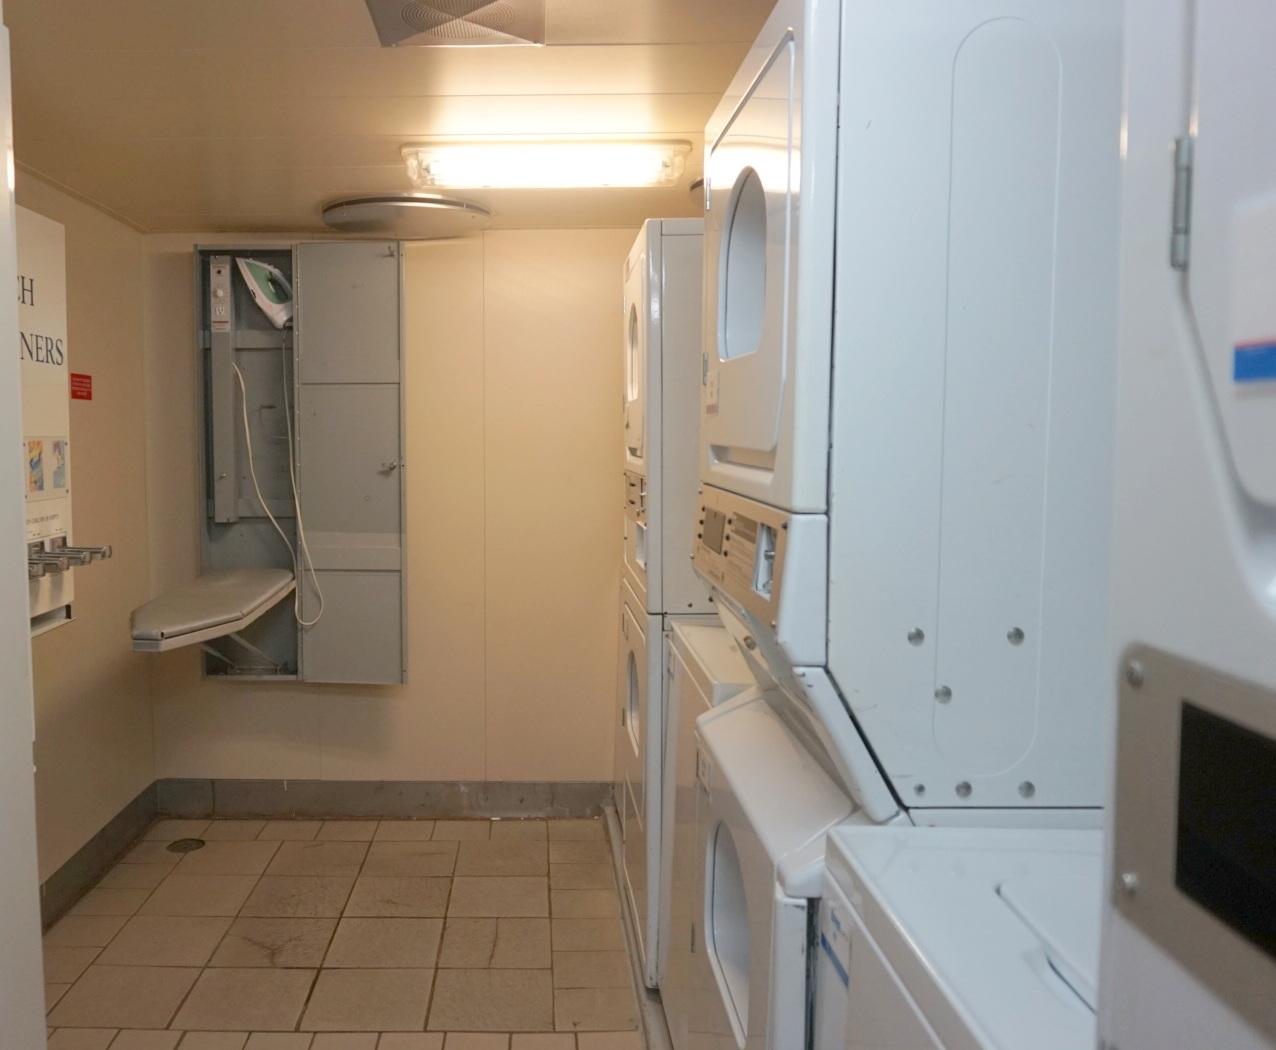 Carnival Glory Self Service Laundry Room ~ The Dias Family ...